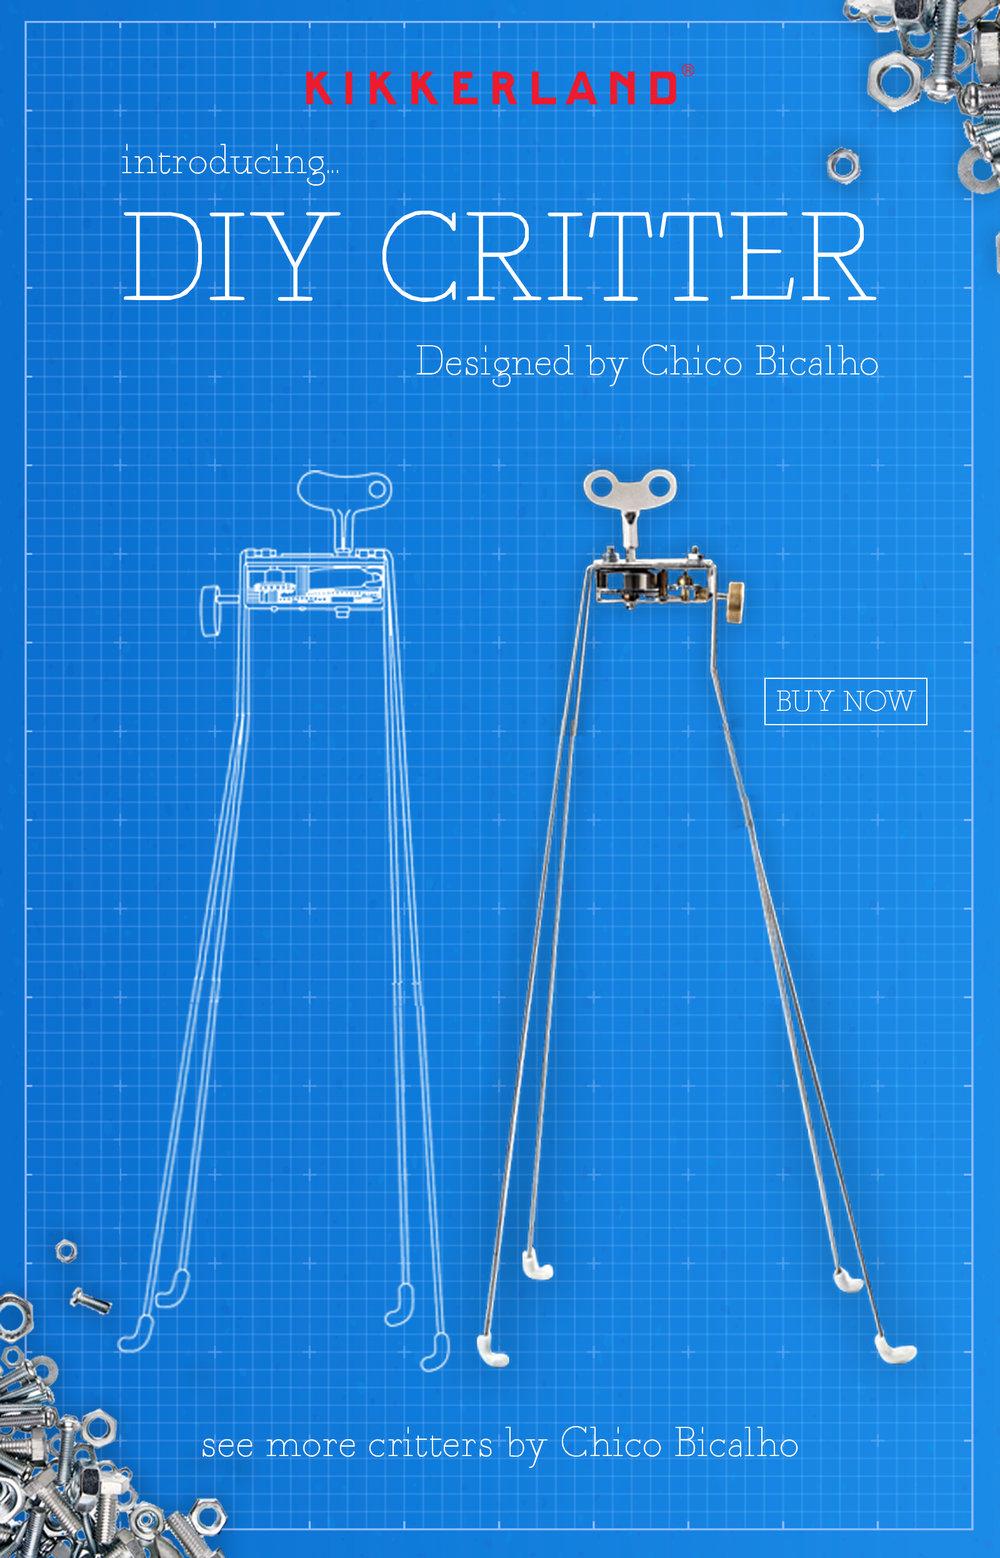 DIYCritter_Blue_emailer.jpg